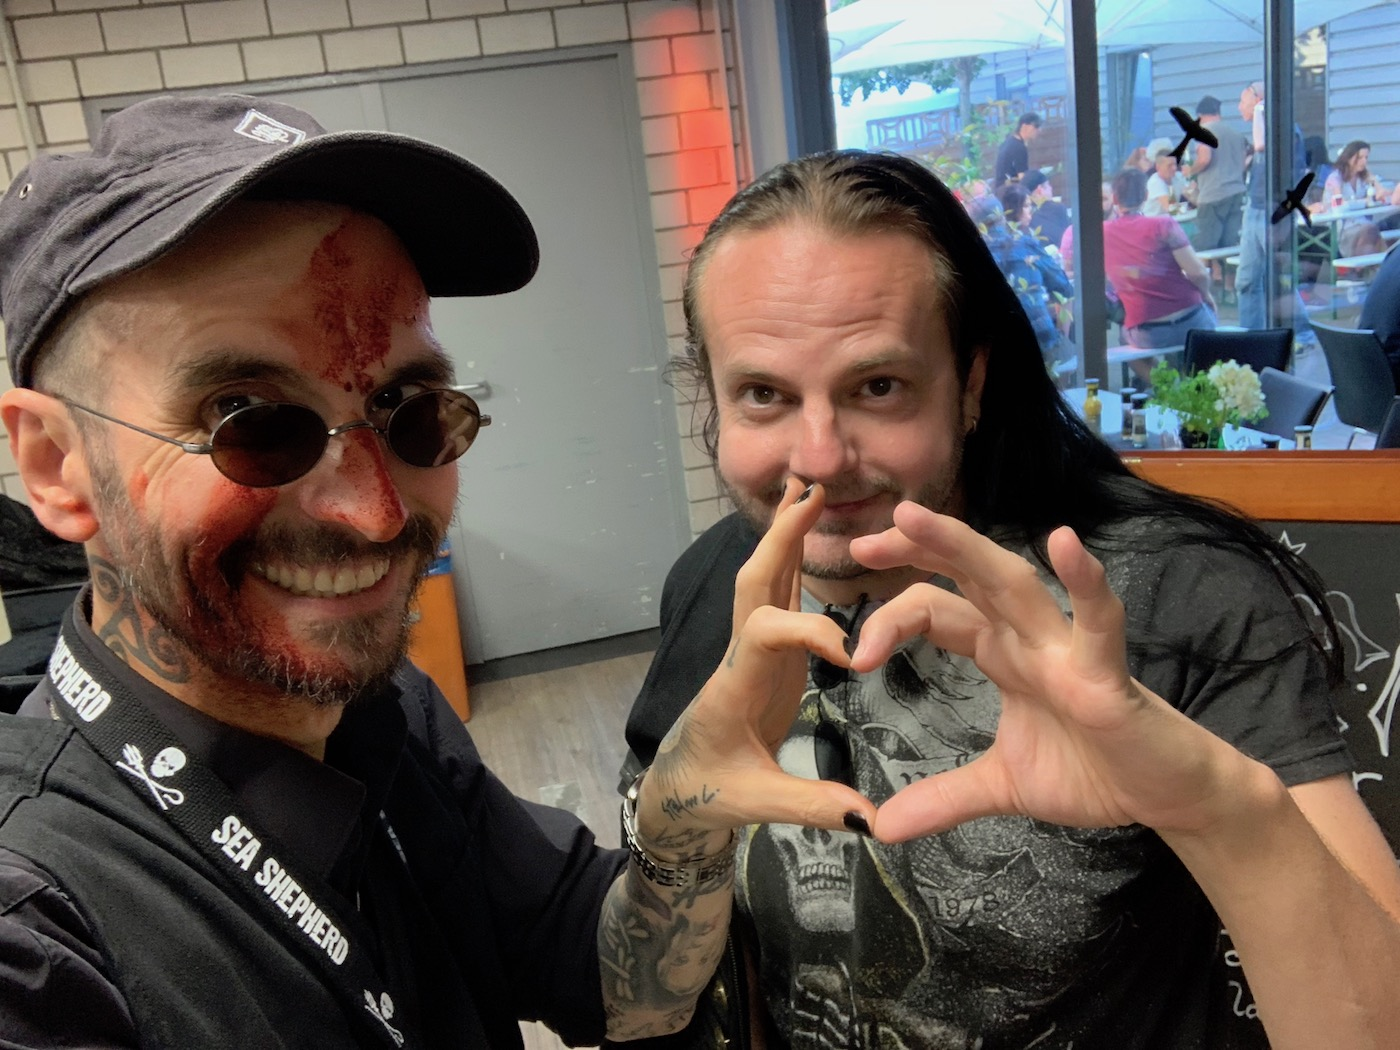 mark_benecke_amphi_festival_koeln_2019 - 205.jpg